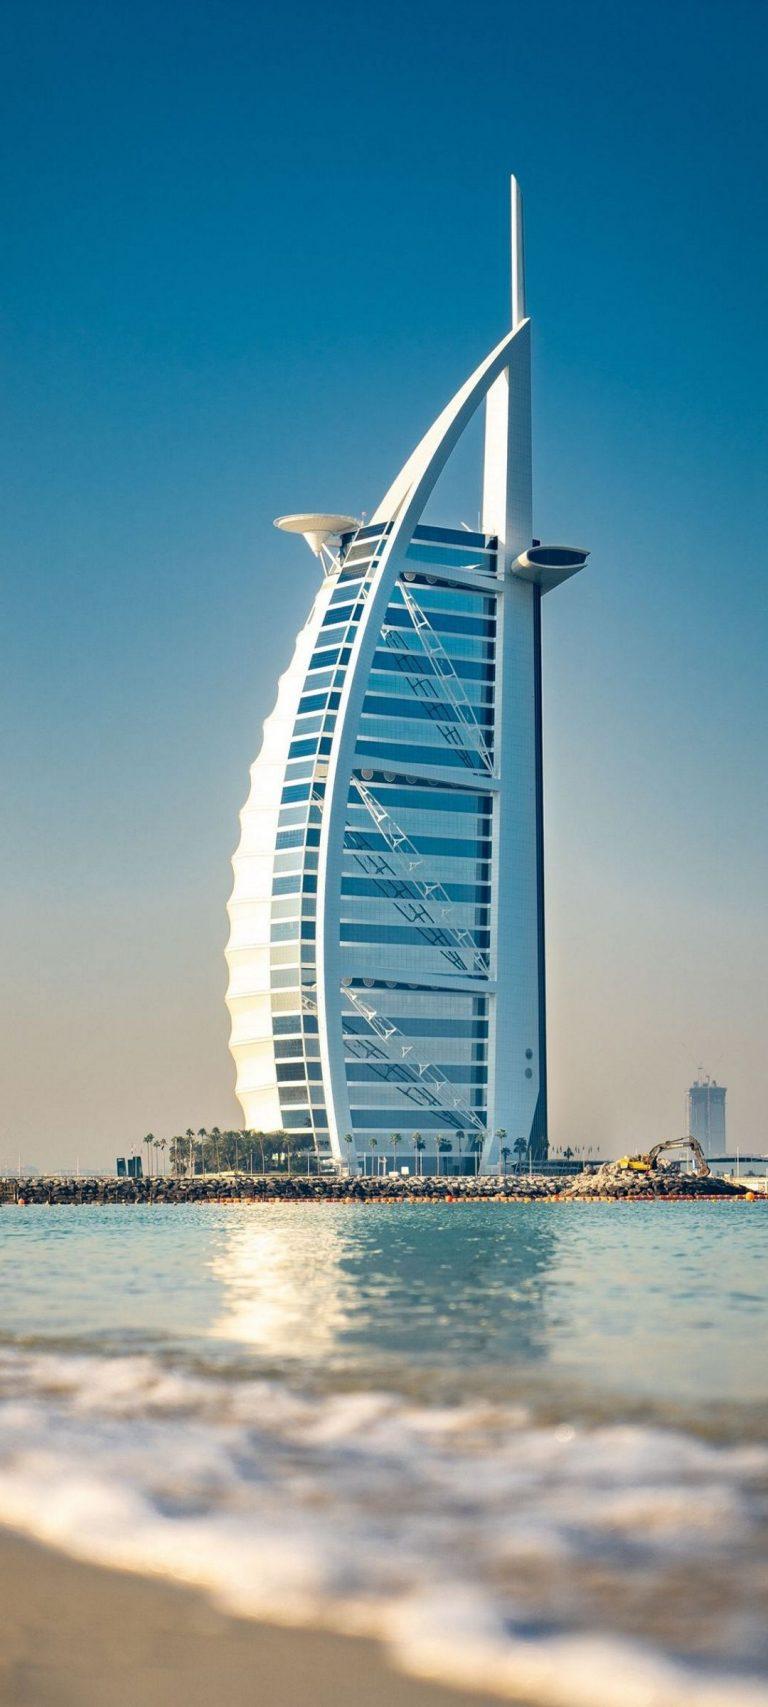 Architecture Building Burj Al Arab 1080x2400 768x1707